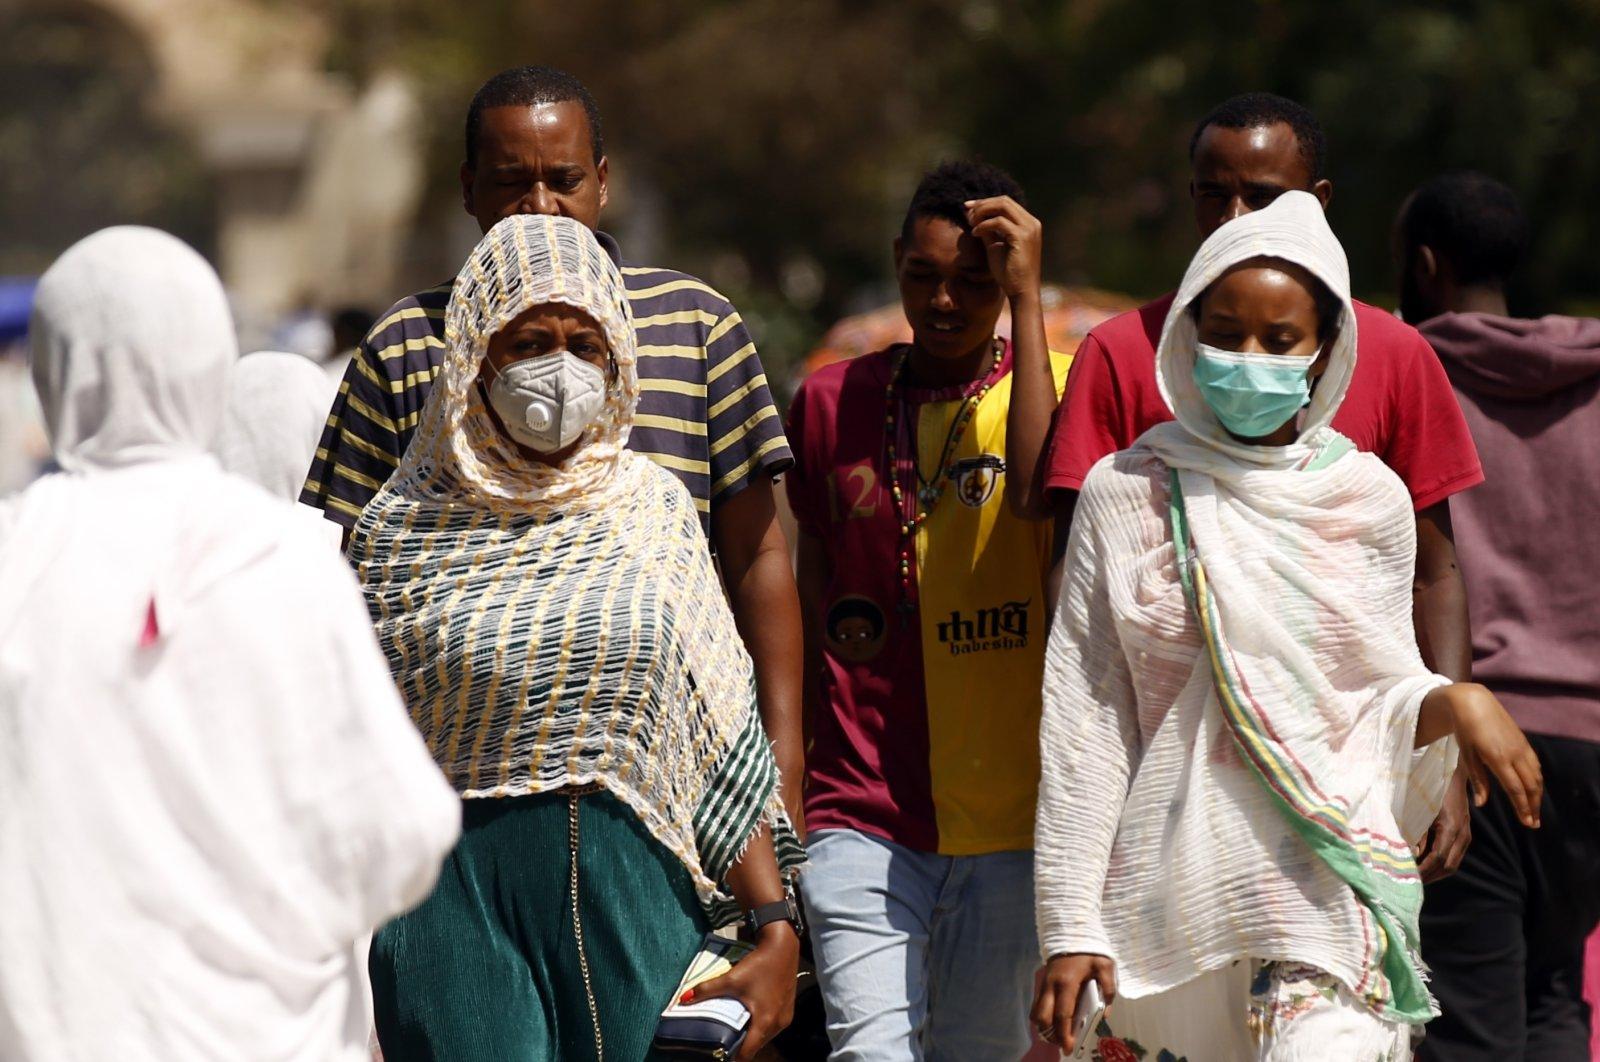 Ethiopian Christians go to churches to celebrate Easter amid the coronavirus outbreak, Addis Ababa, Ethiopia, April 13, 2020. (AA Photo)